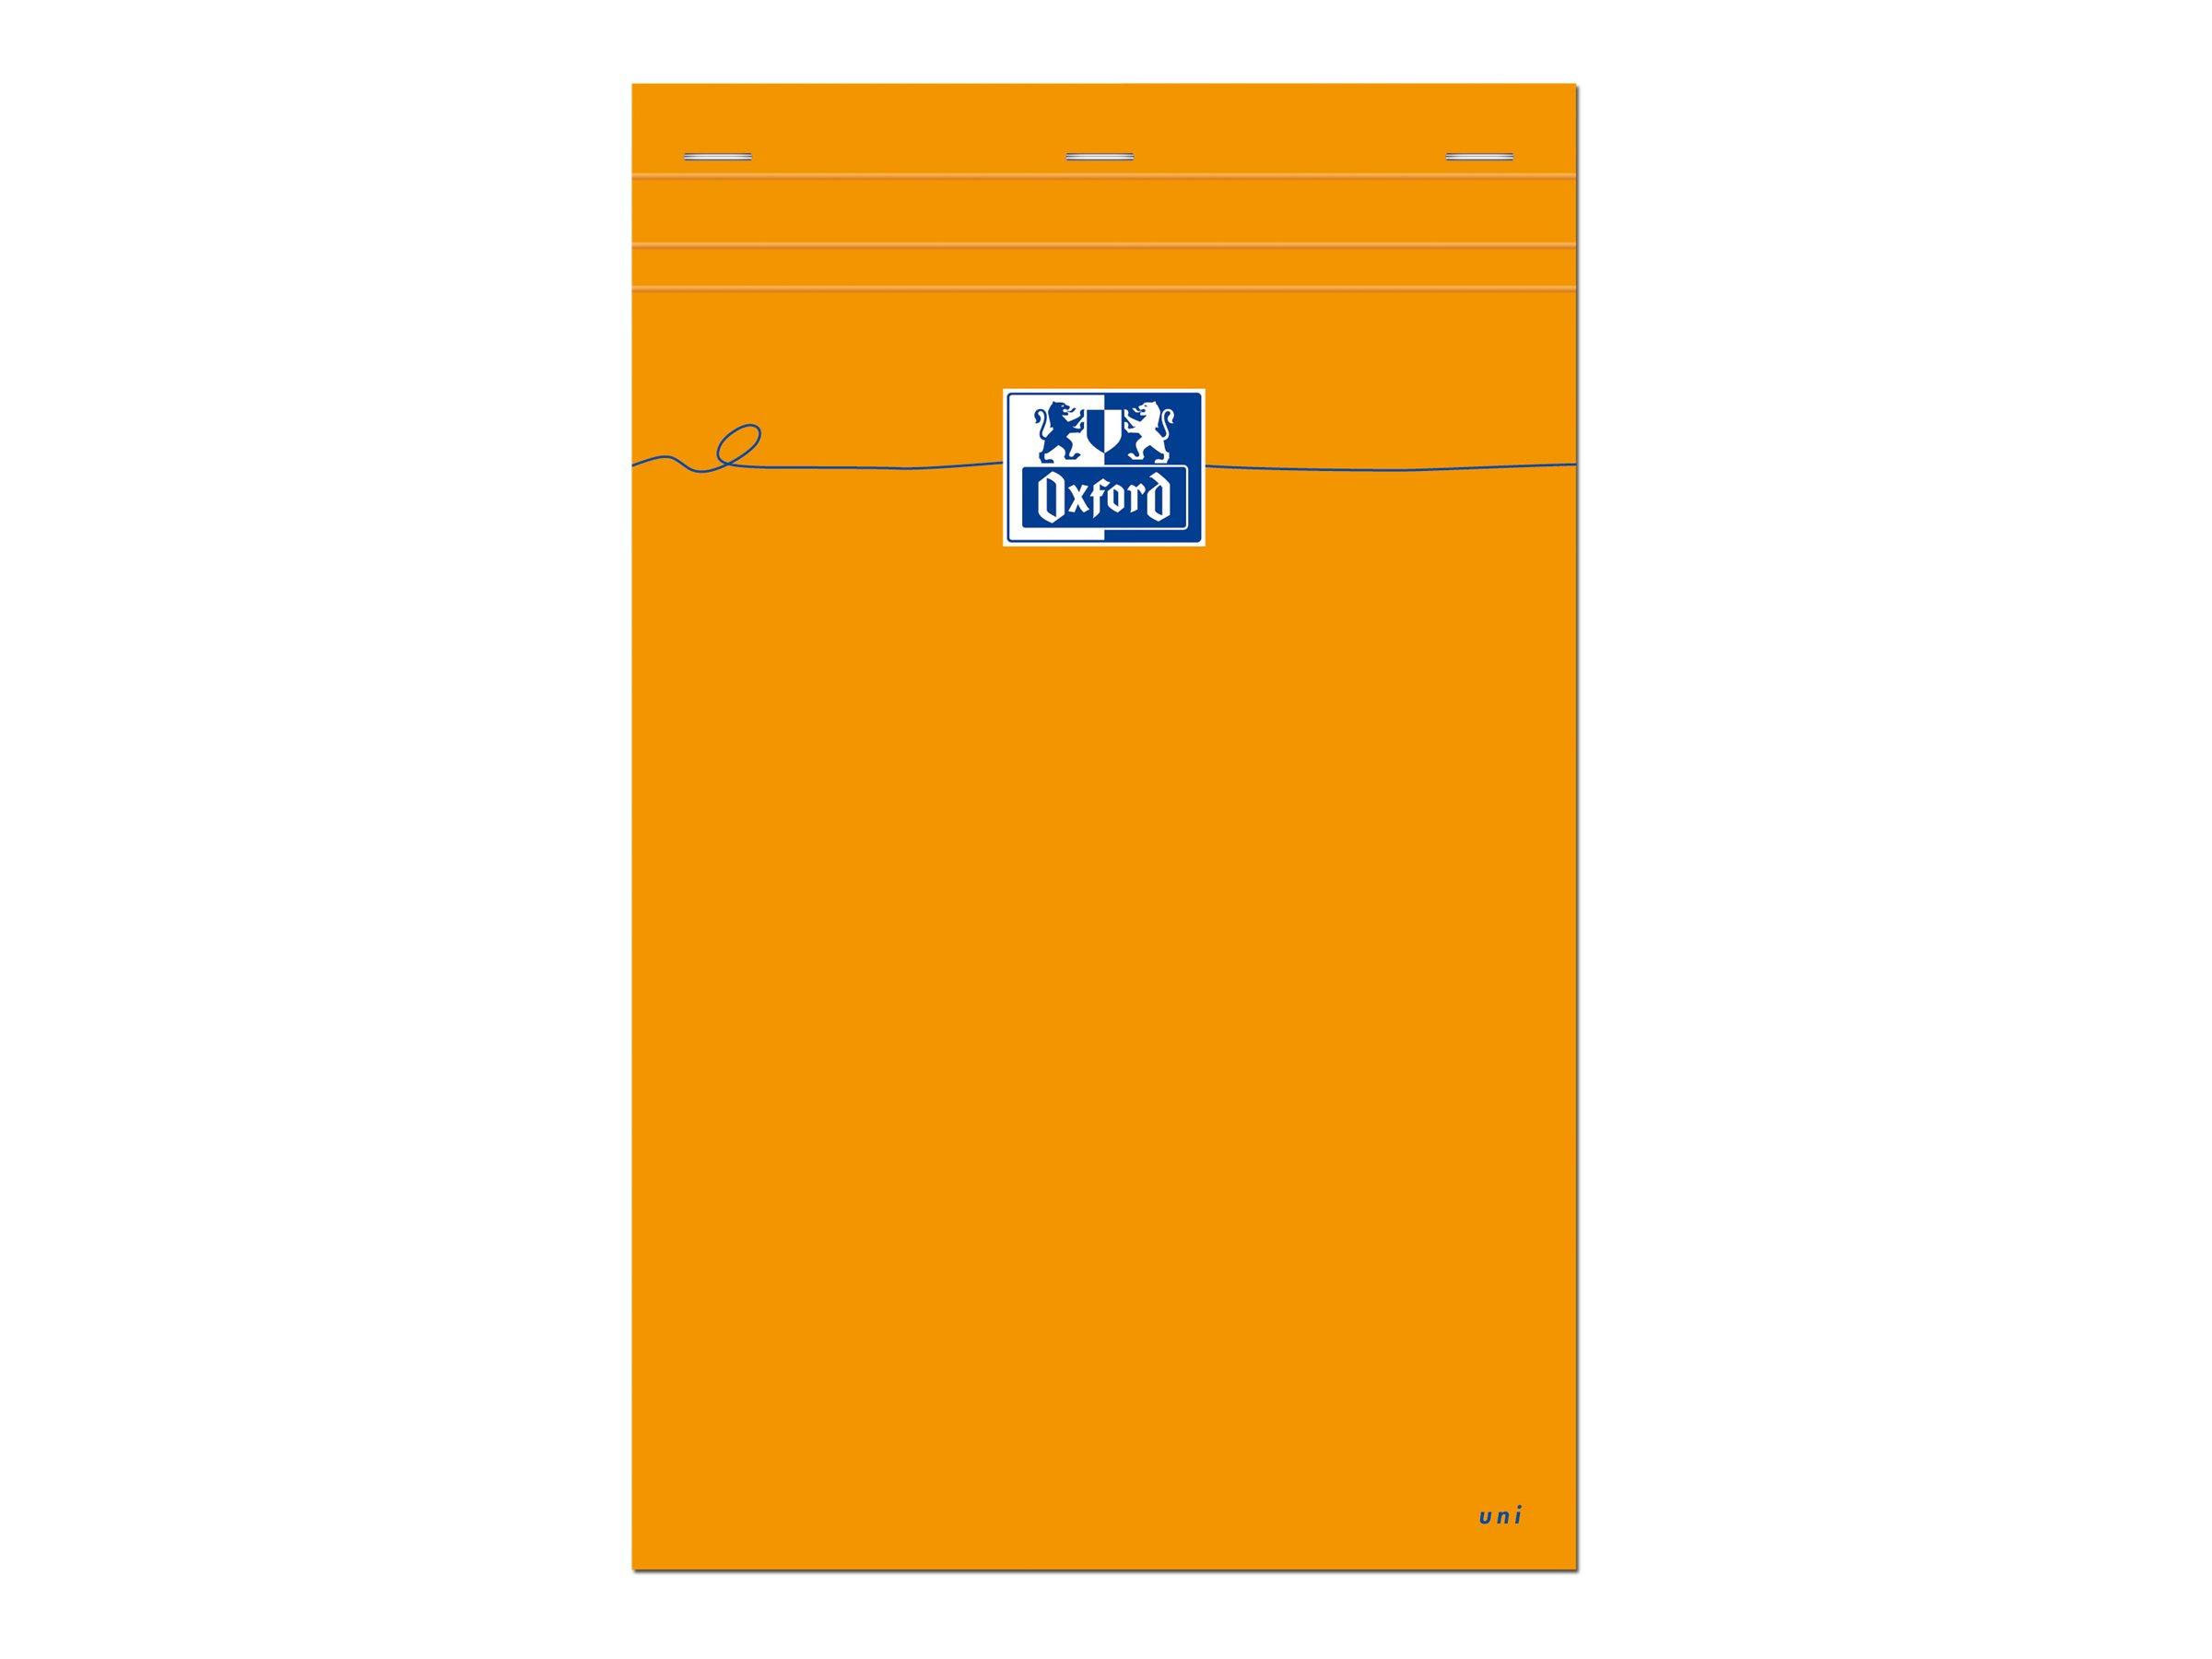 Oxford - Bloc notes - A4 + - 160 pages - blanc - 80G - orange